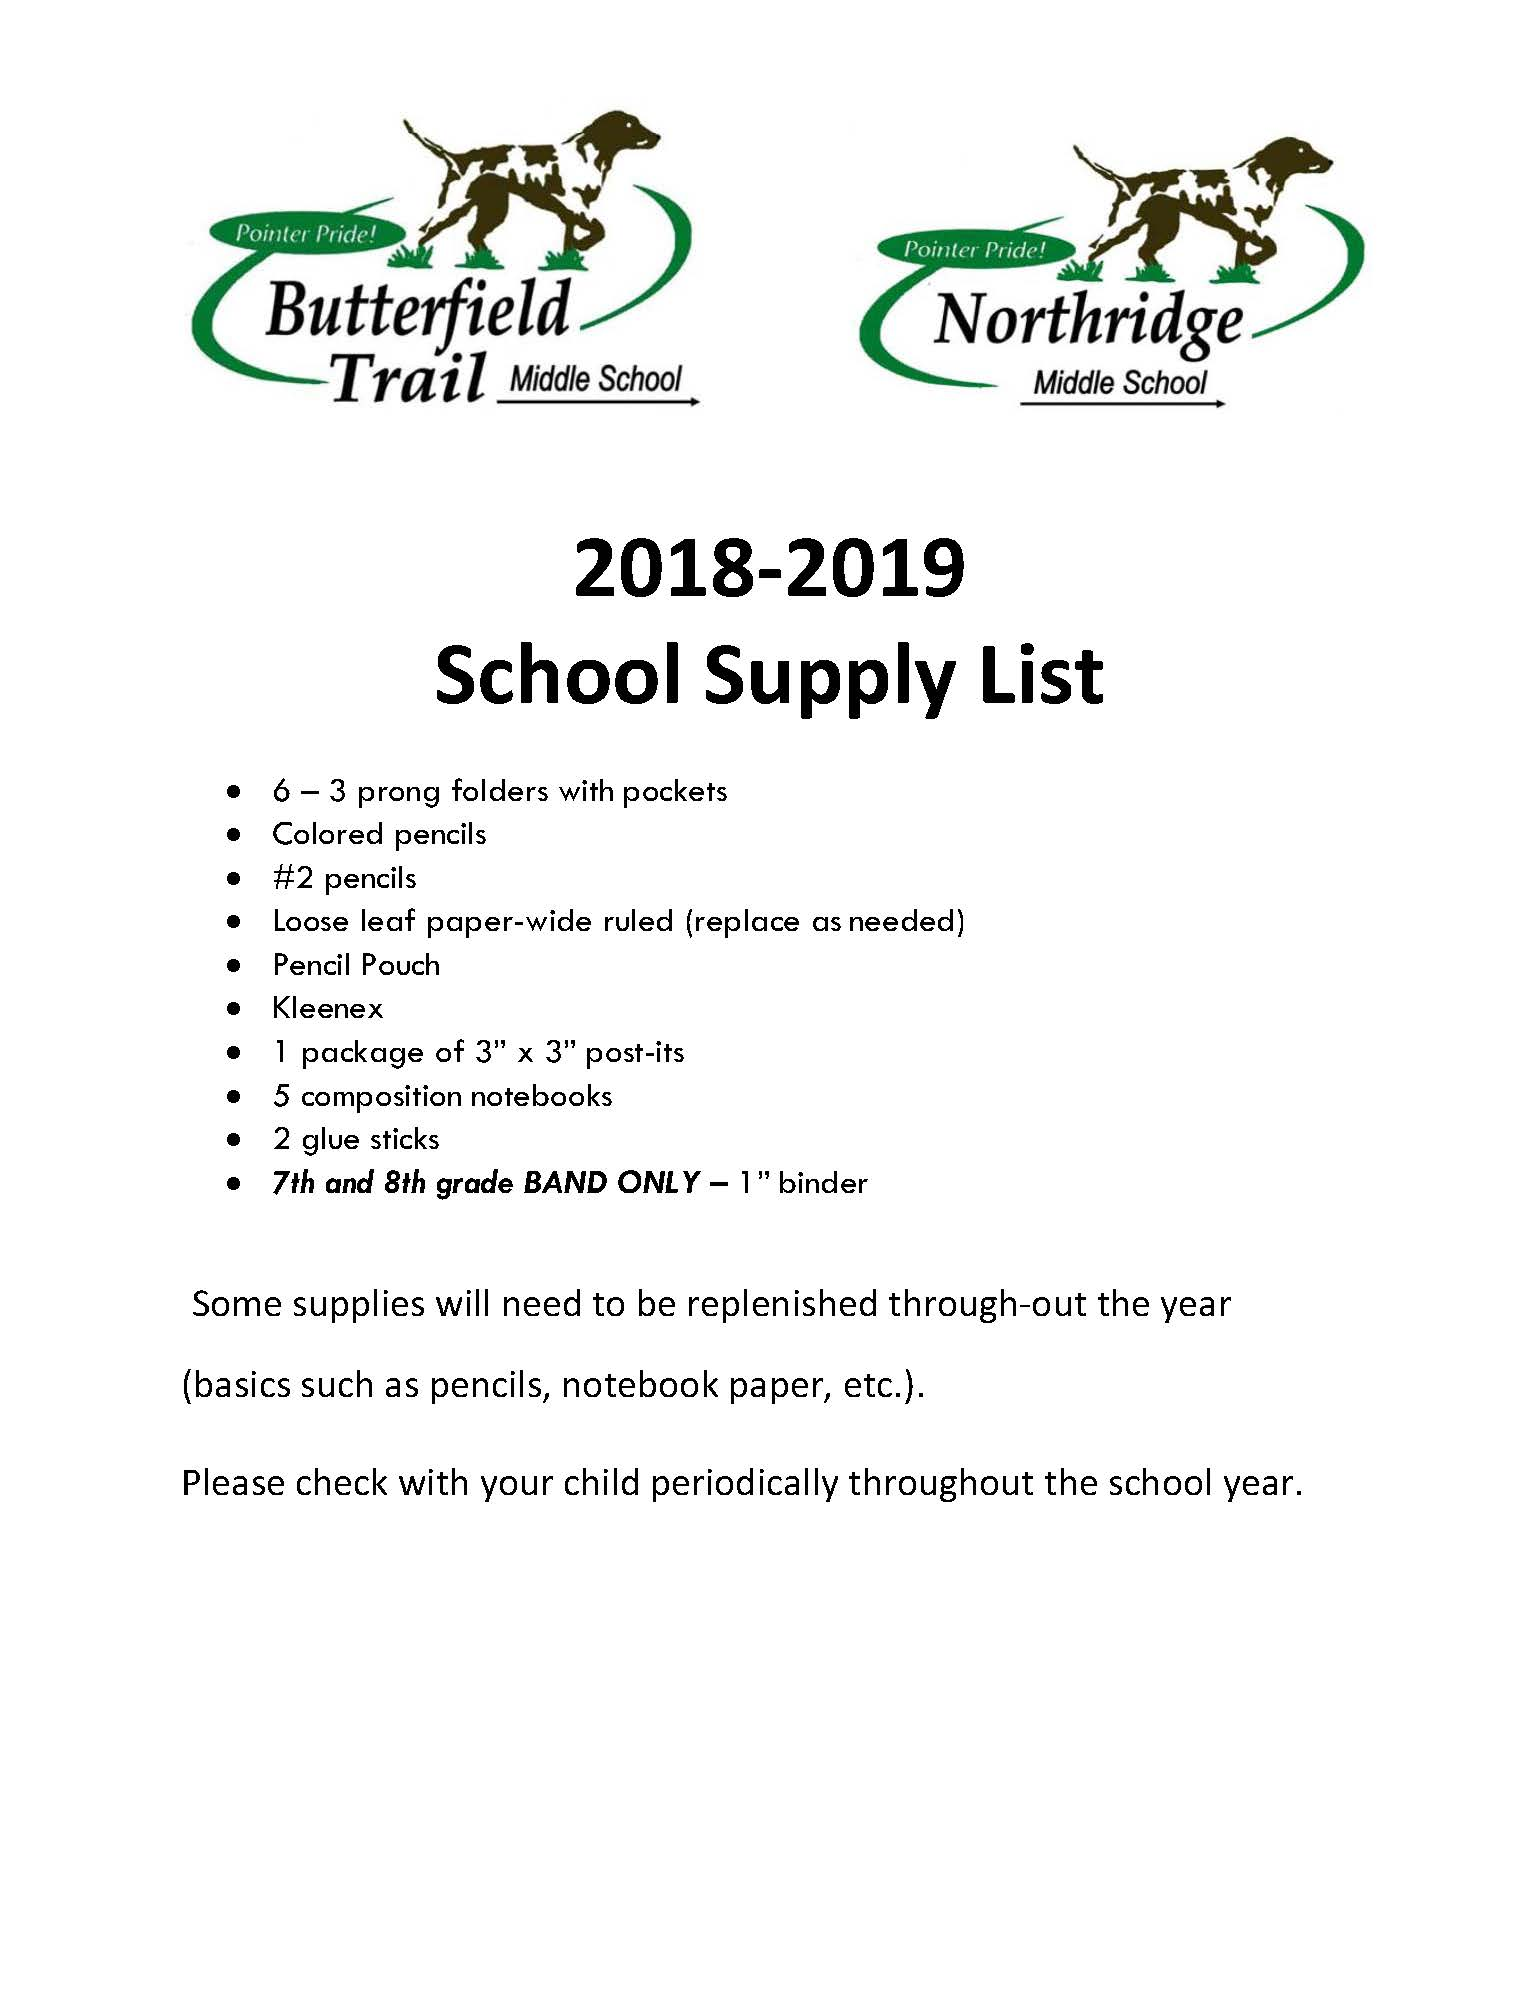 School Supply List 18-19 NRMS